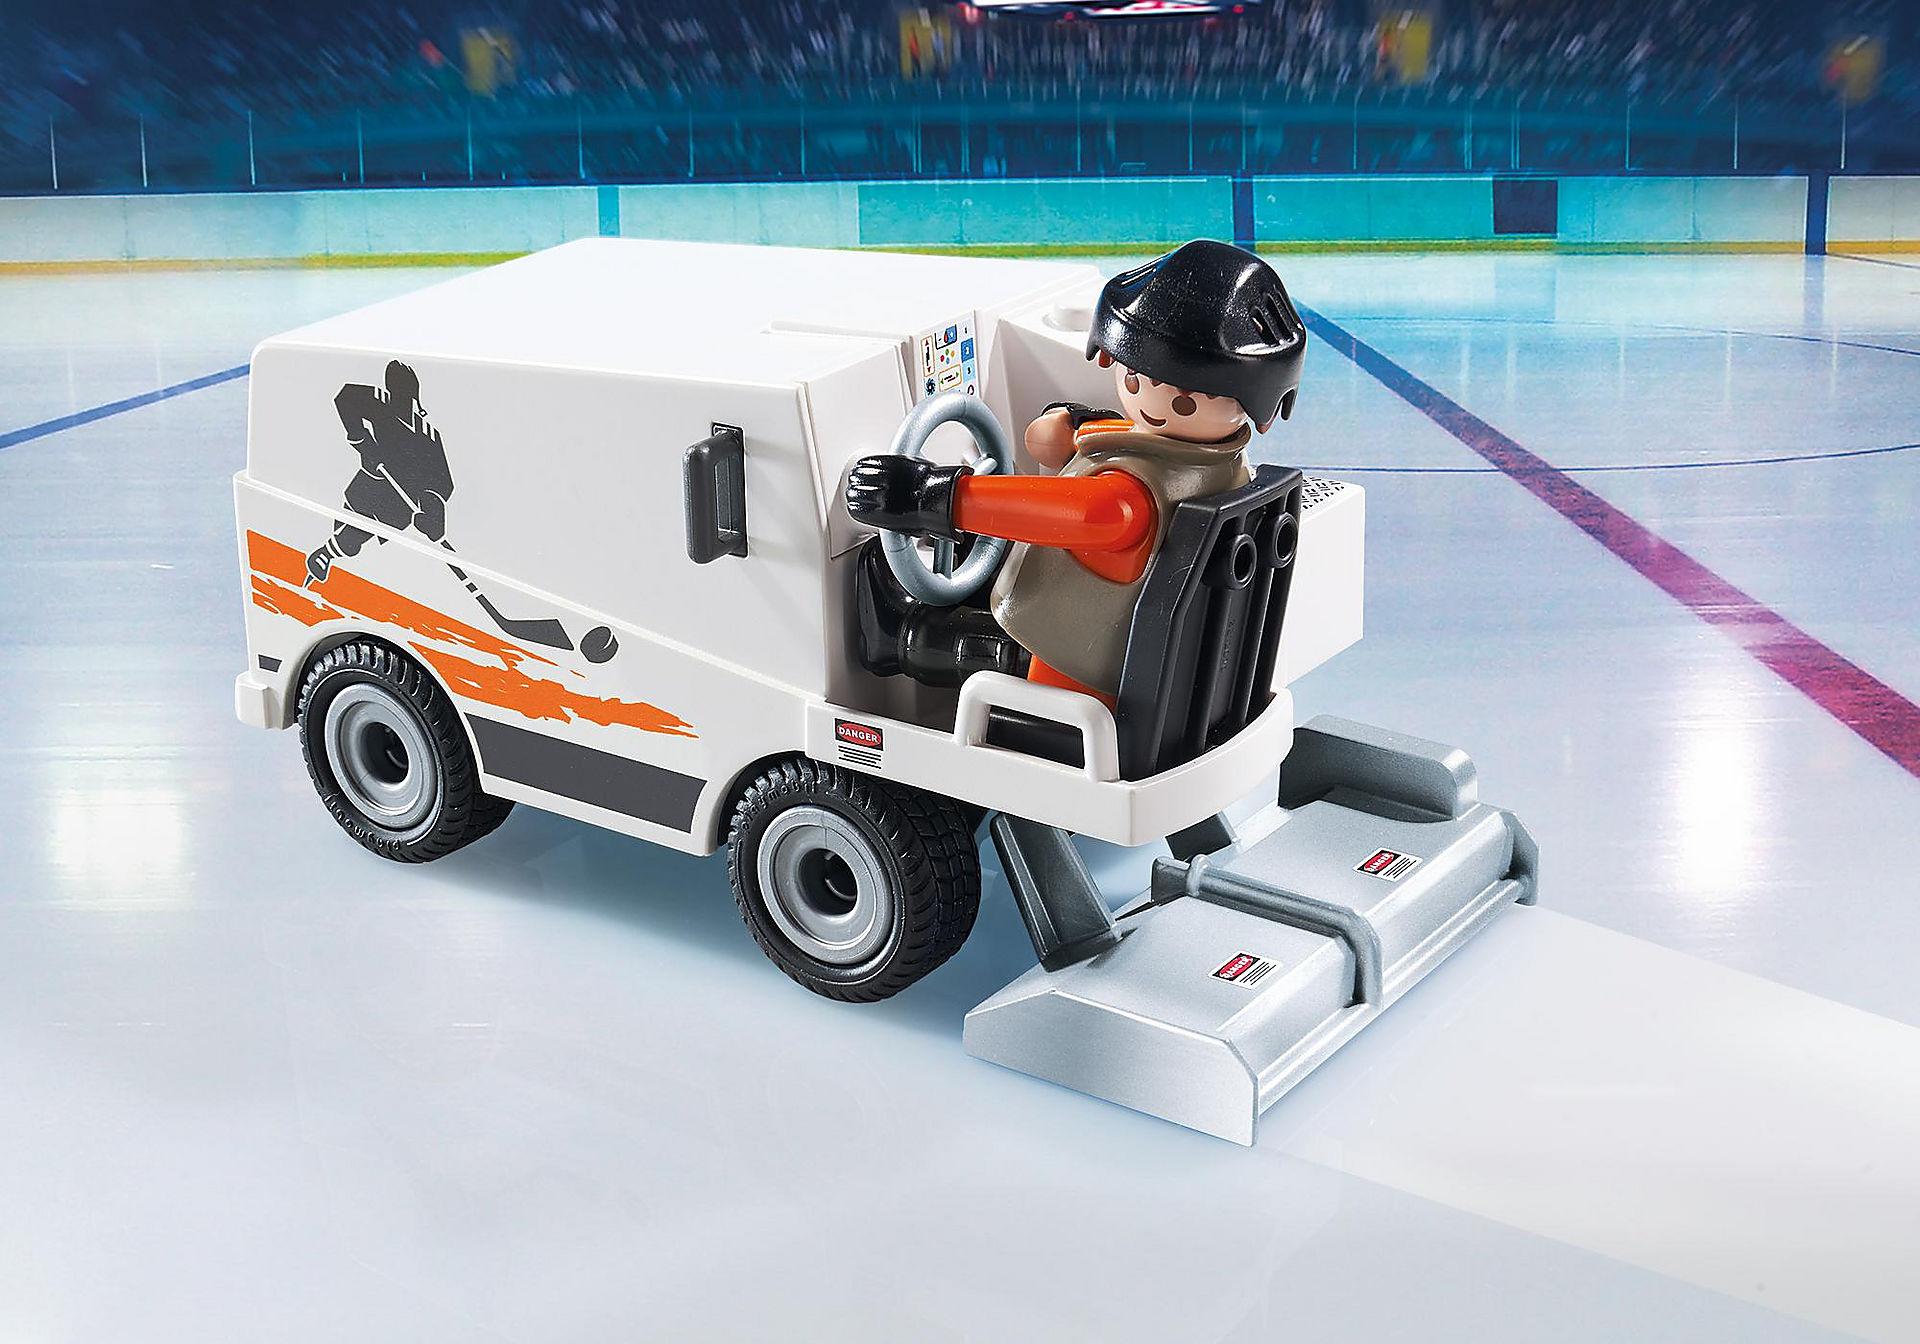 6193 Eisbearbeitungsmaschine zoom image4